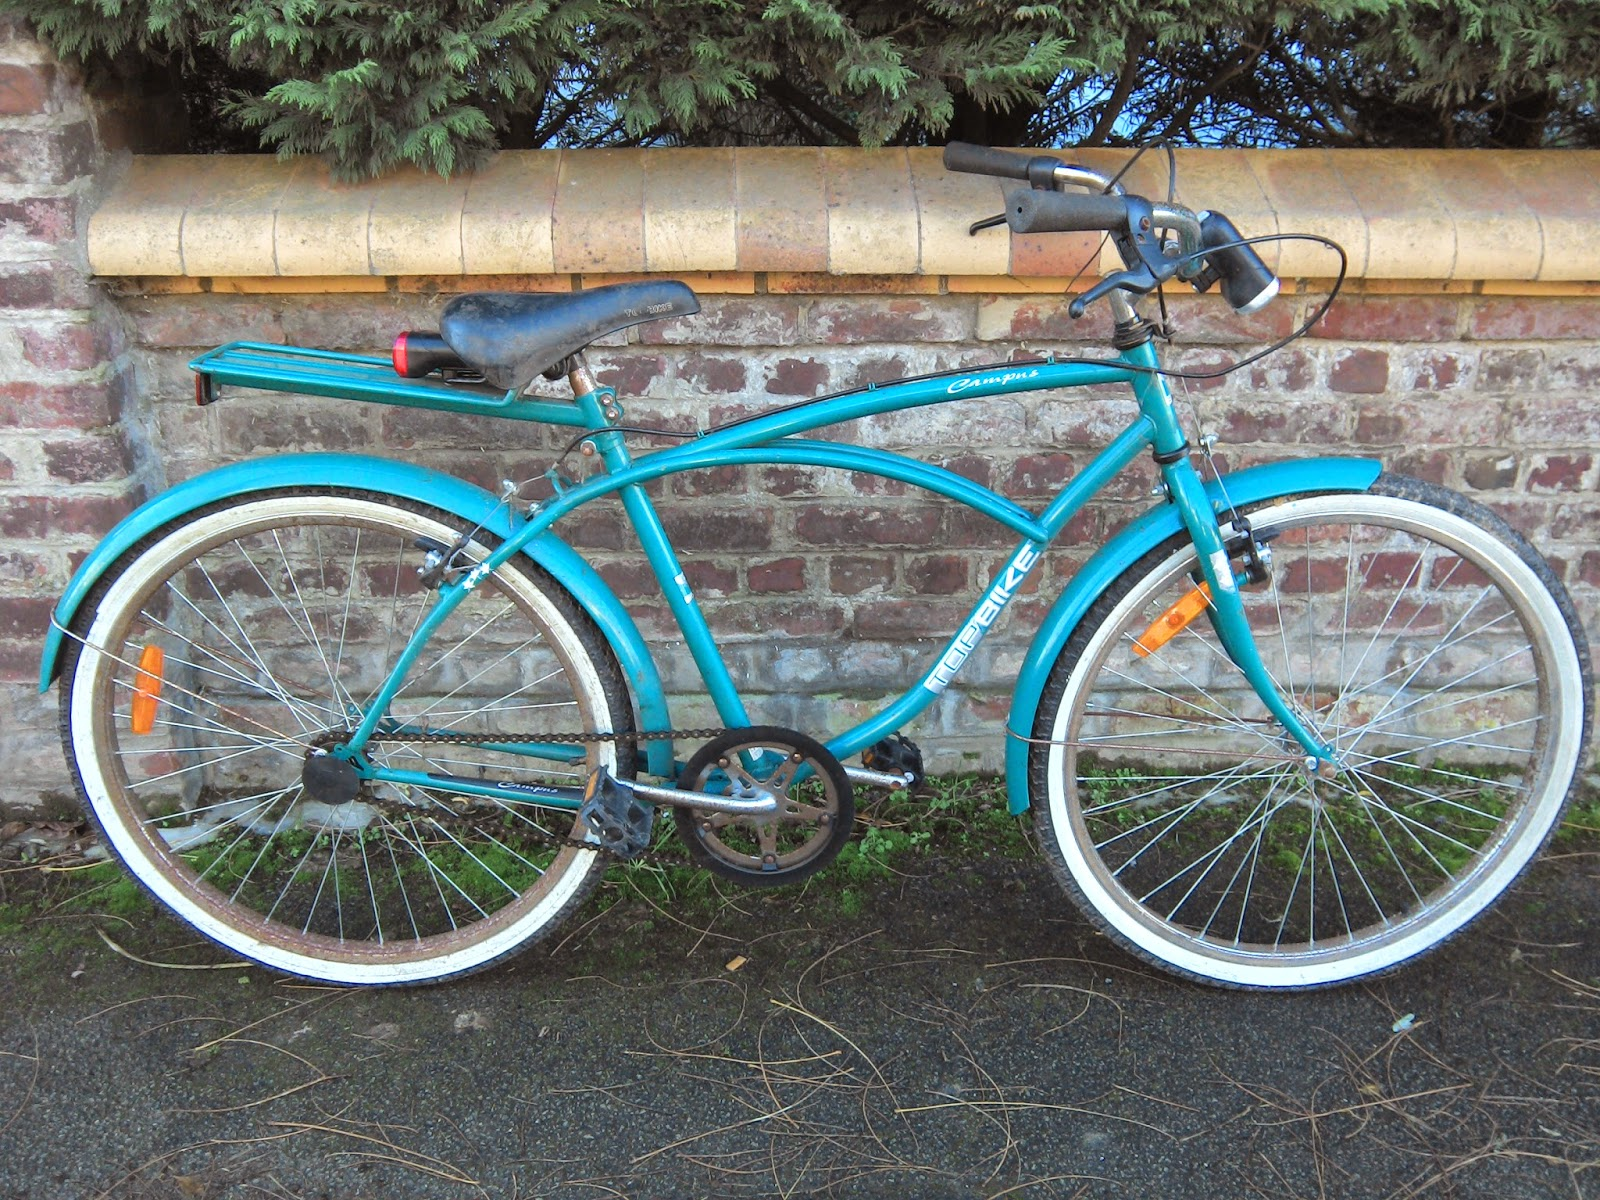 poutro kustom cycles top moumoute bike. Black Bedroom Furniture Sets. Home Design Ideas